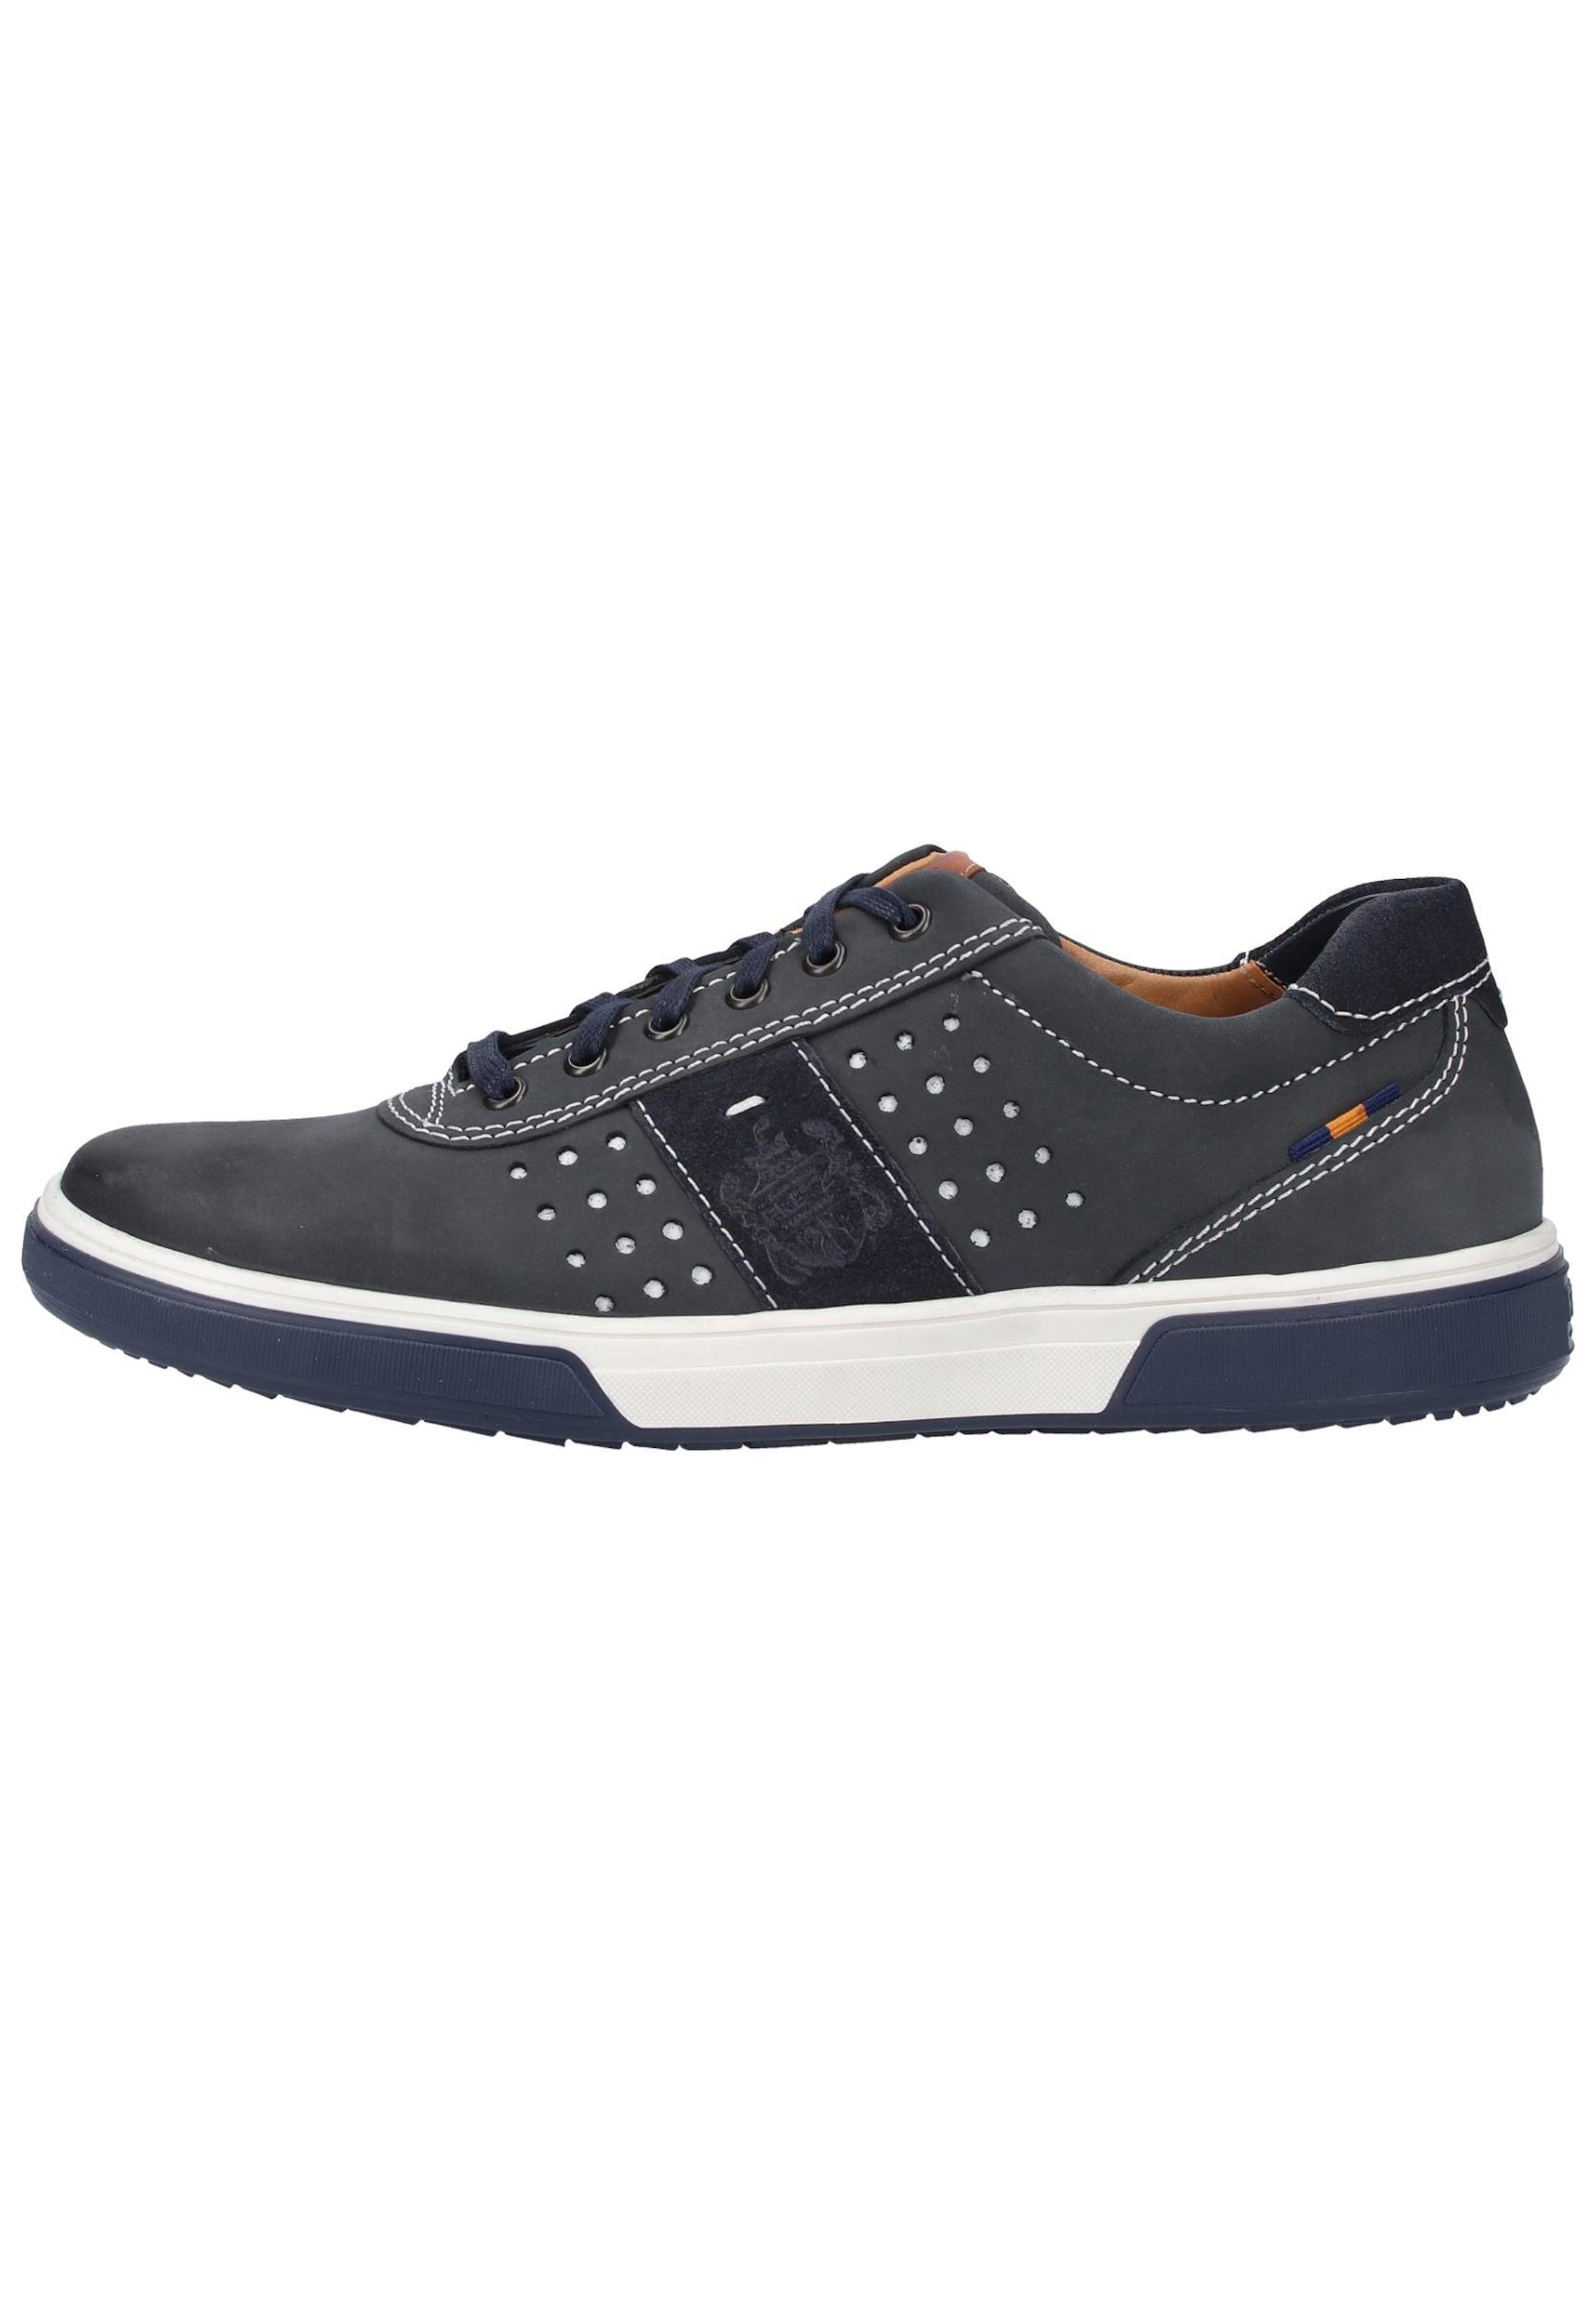 In TaubenblauViolettblau Men Sneaker Fretz Y7gb6vfy